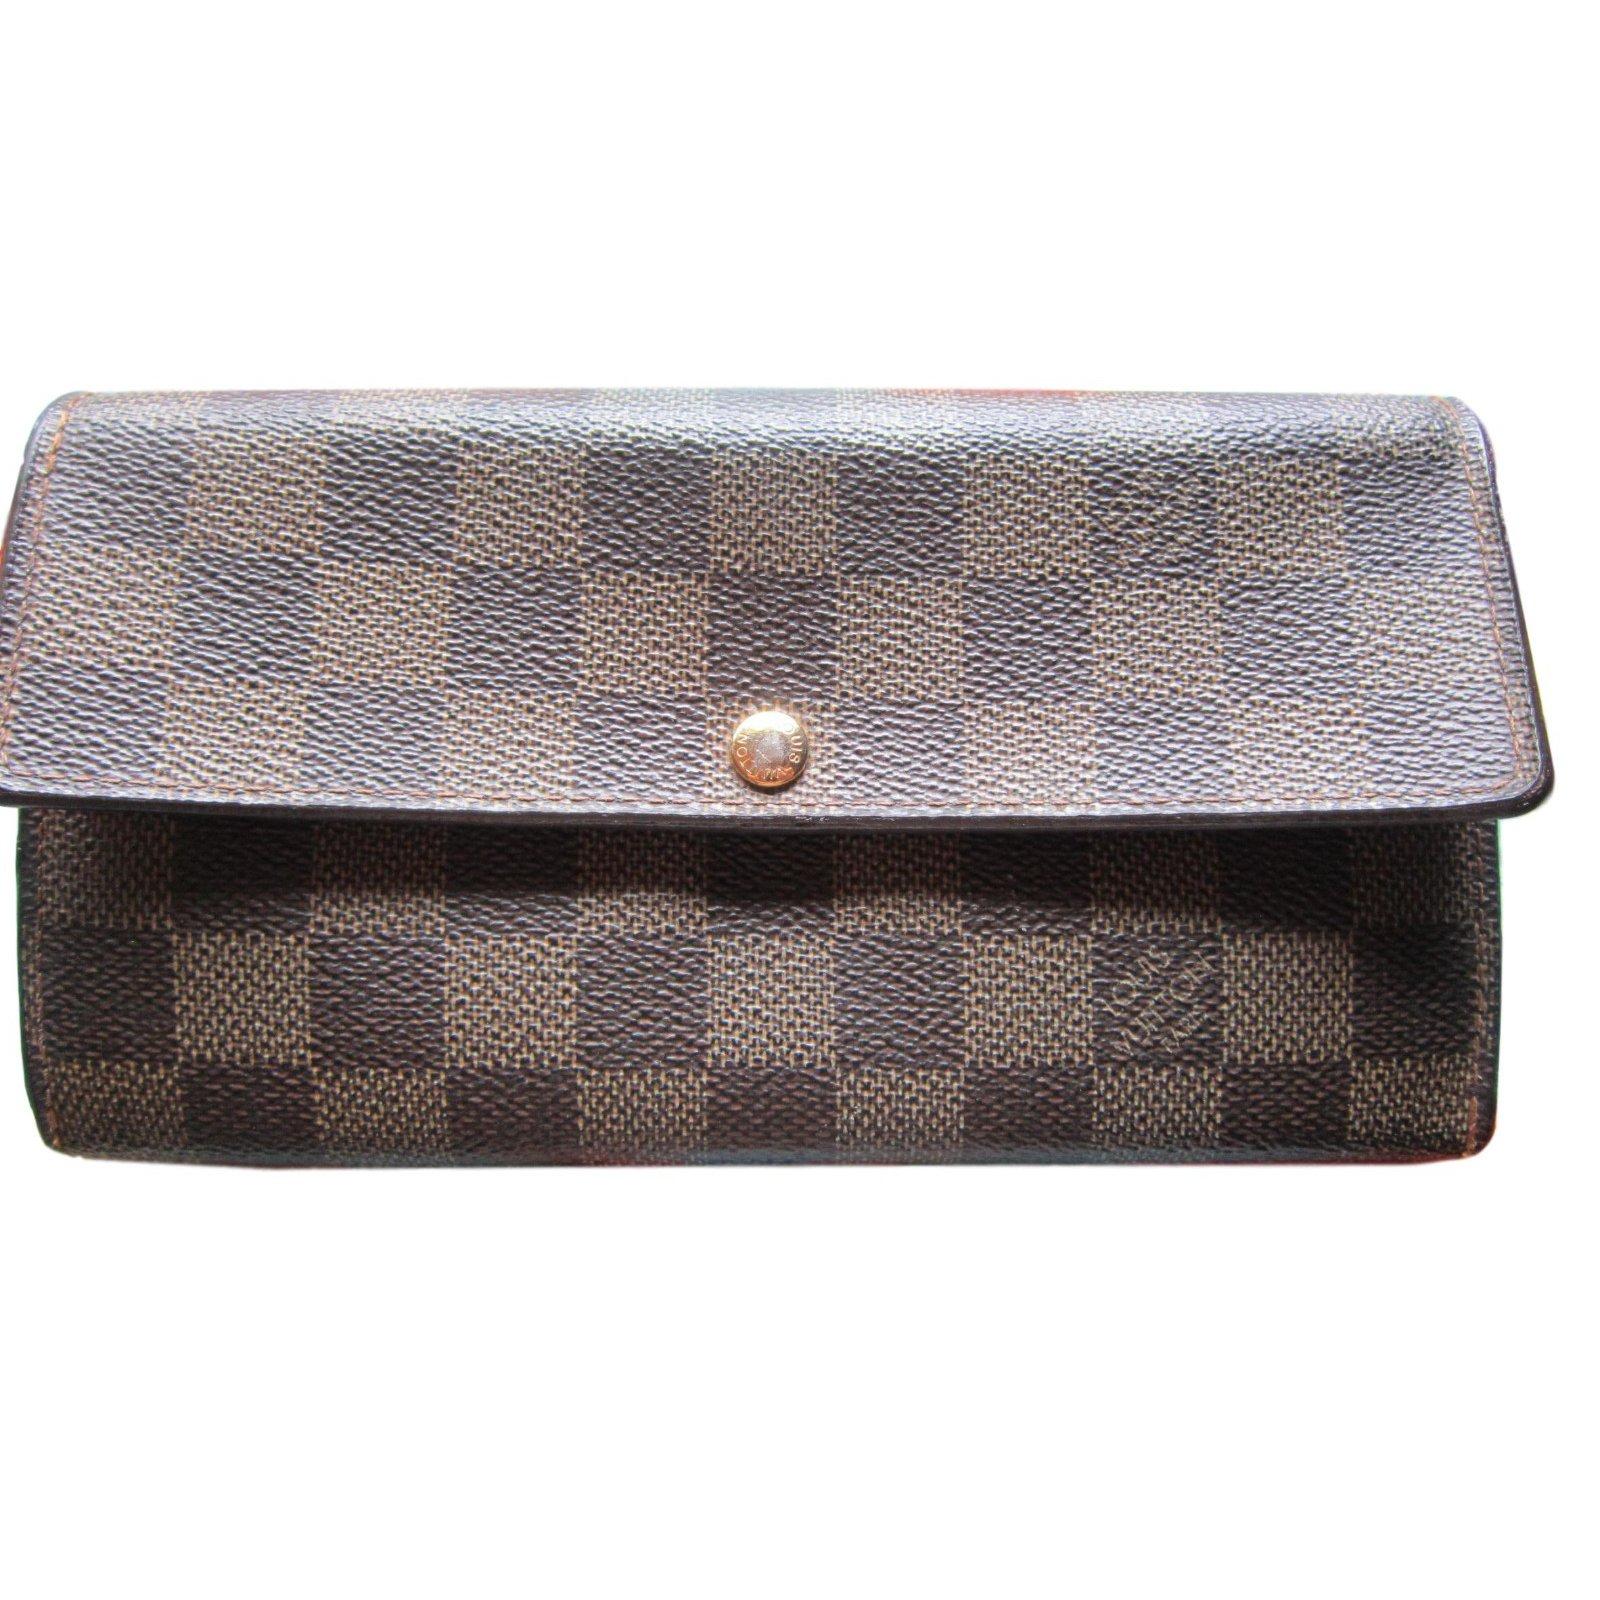 7b7ededaf0847 Louis Vuitton Sarah Purse Wallets Leather Brown ref.78201 - Joli Closet